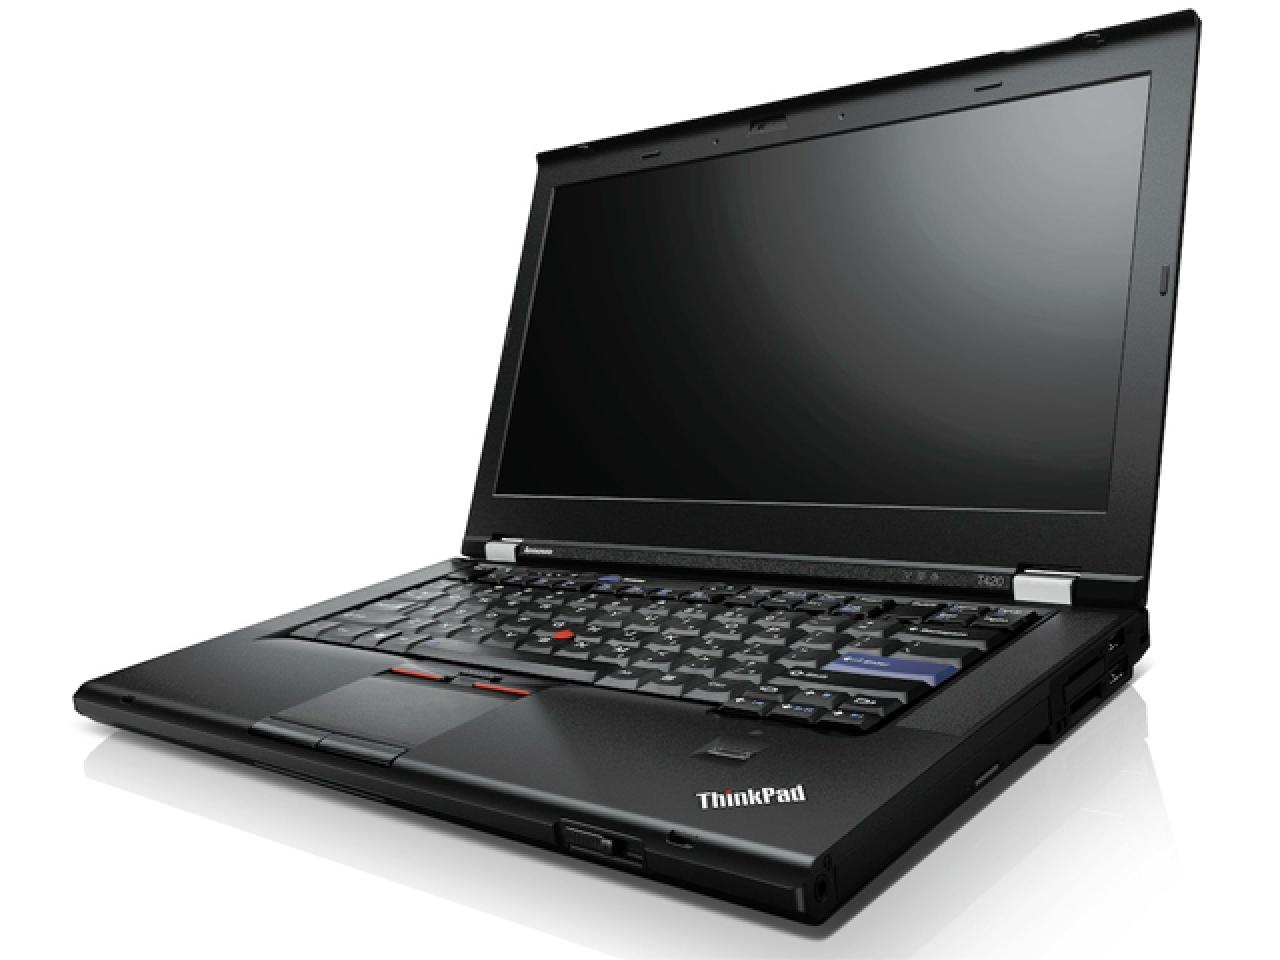 Lenovo ThinkPad T420  - shop.bb-net.de